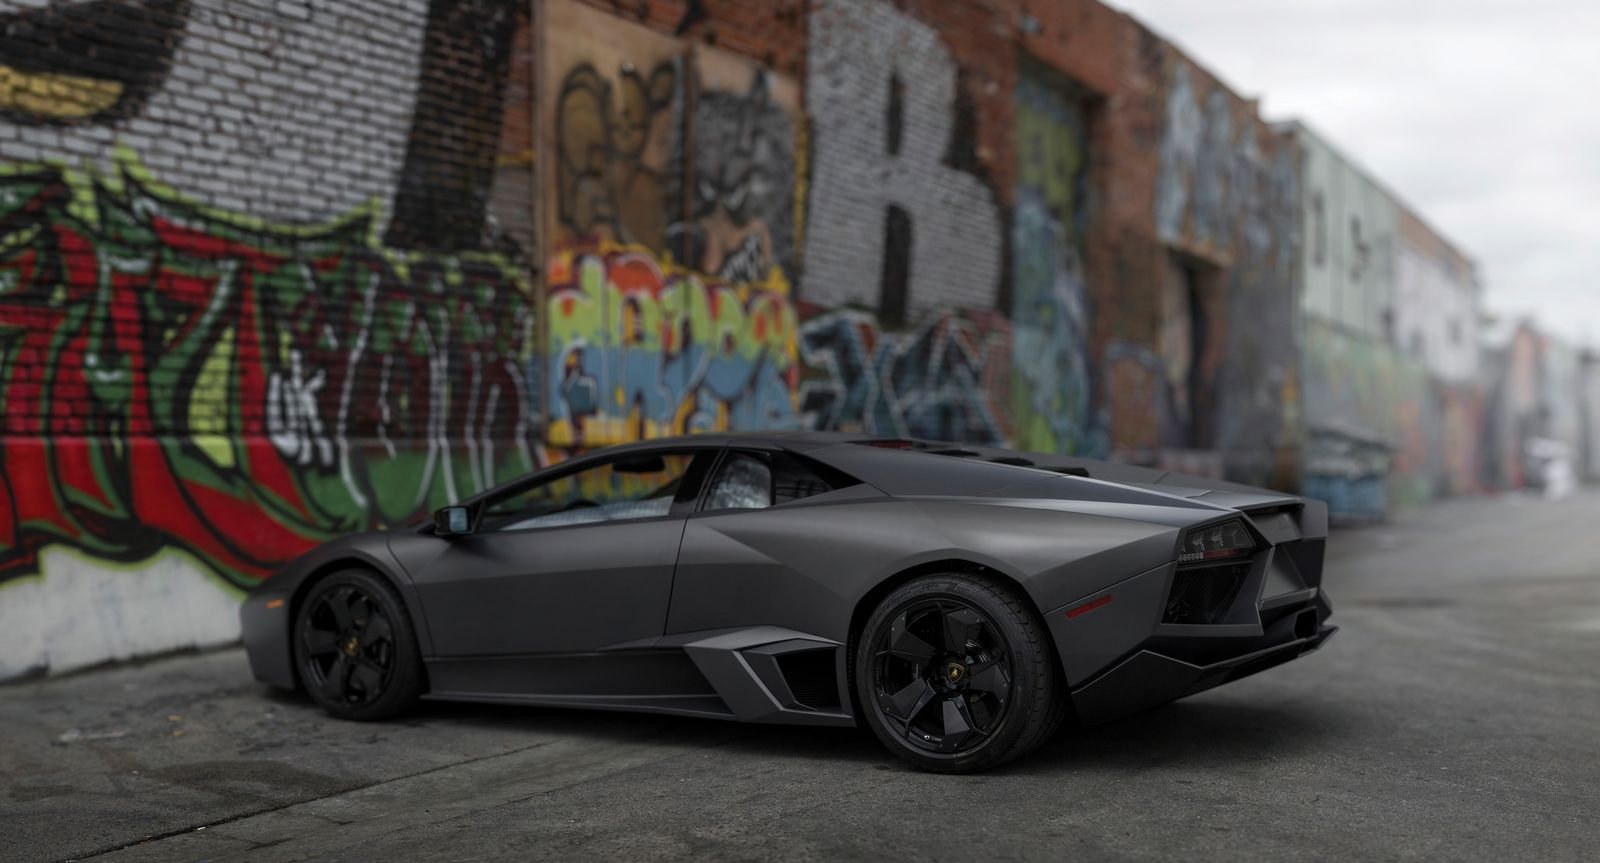 lamborghini reventon auction side - Lamborghini Reventon